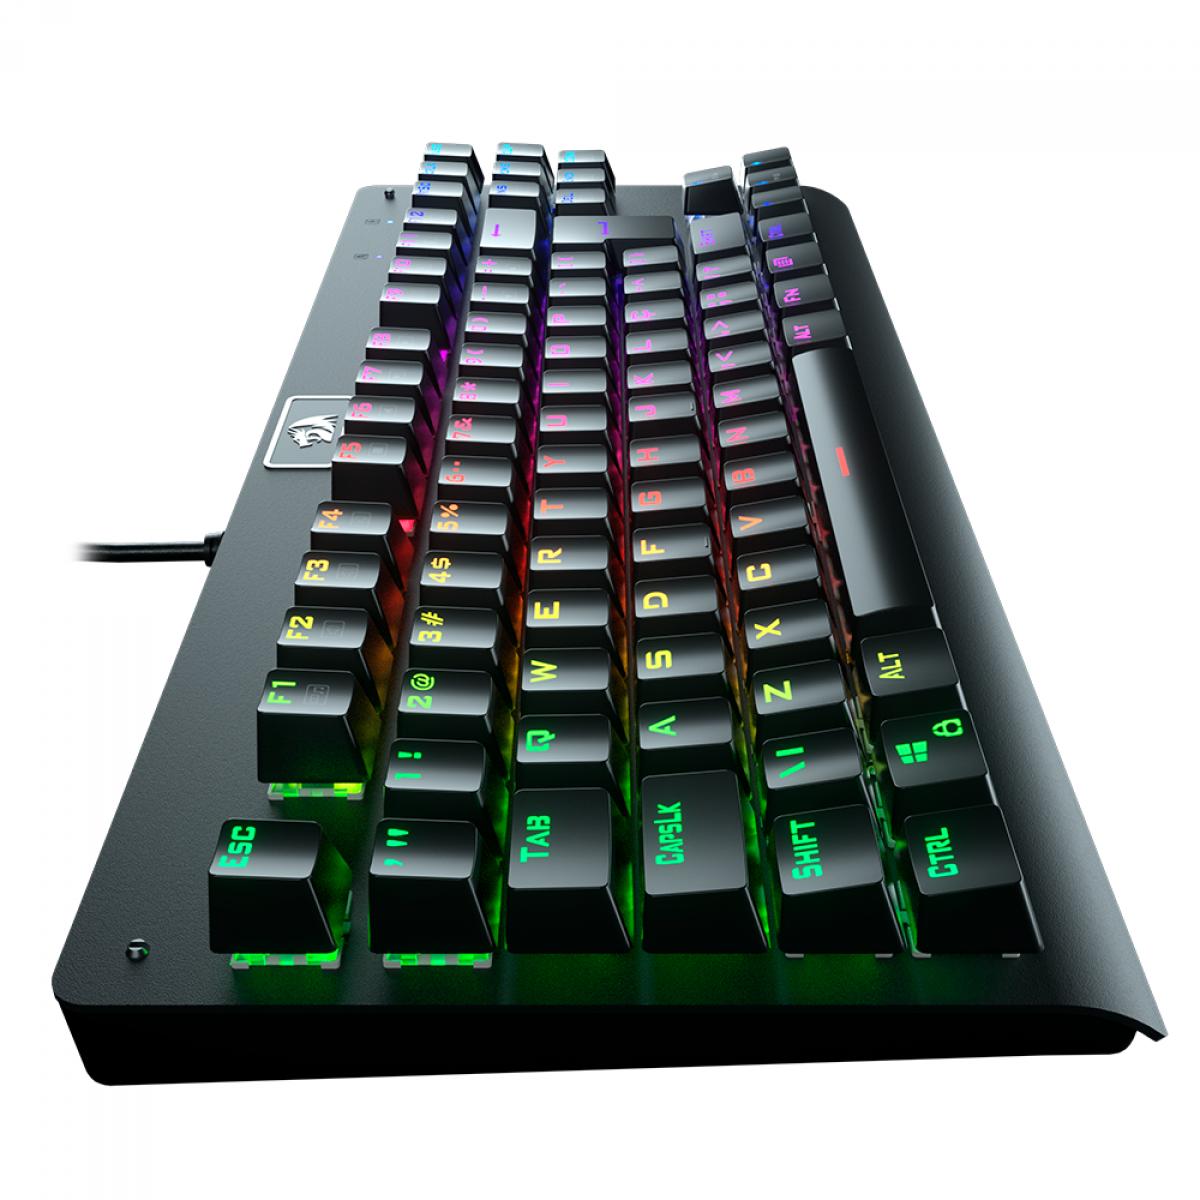 Teclado Mecânico Gamer Redragon Dark Avenger K568 RGB, Switch Outemu Brown, ABNT2, Black